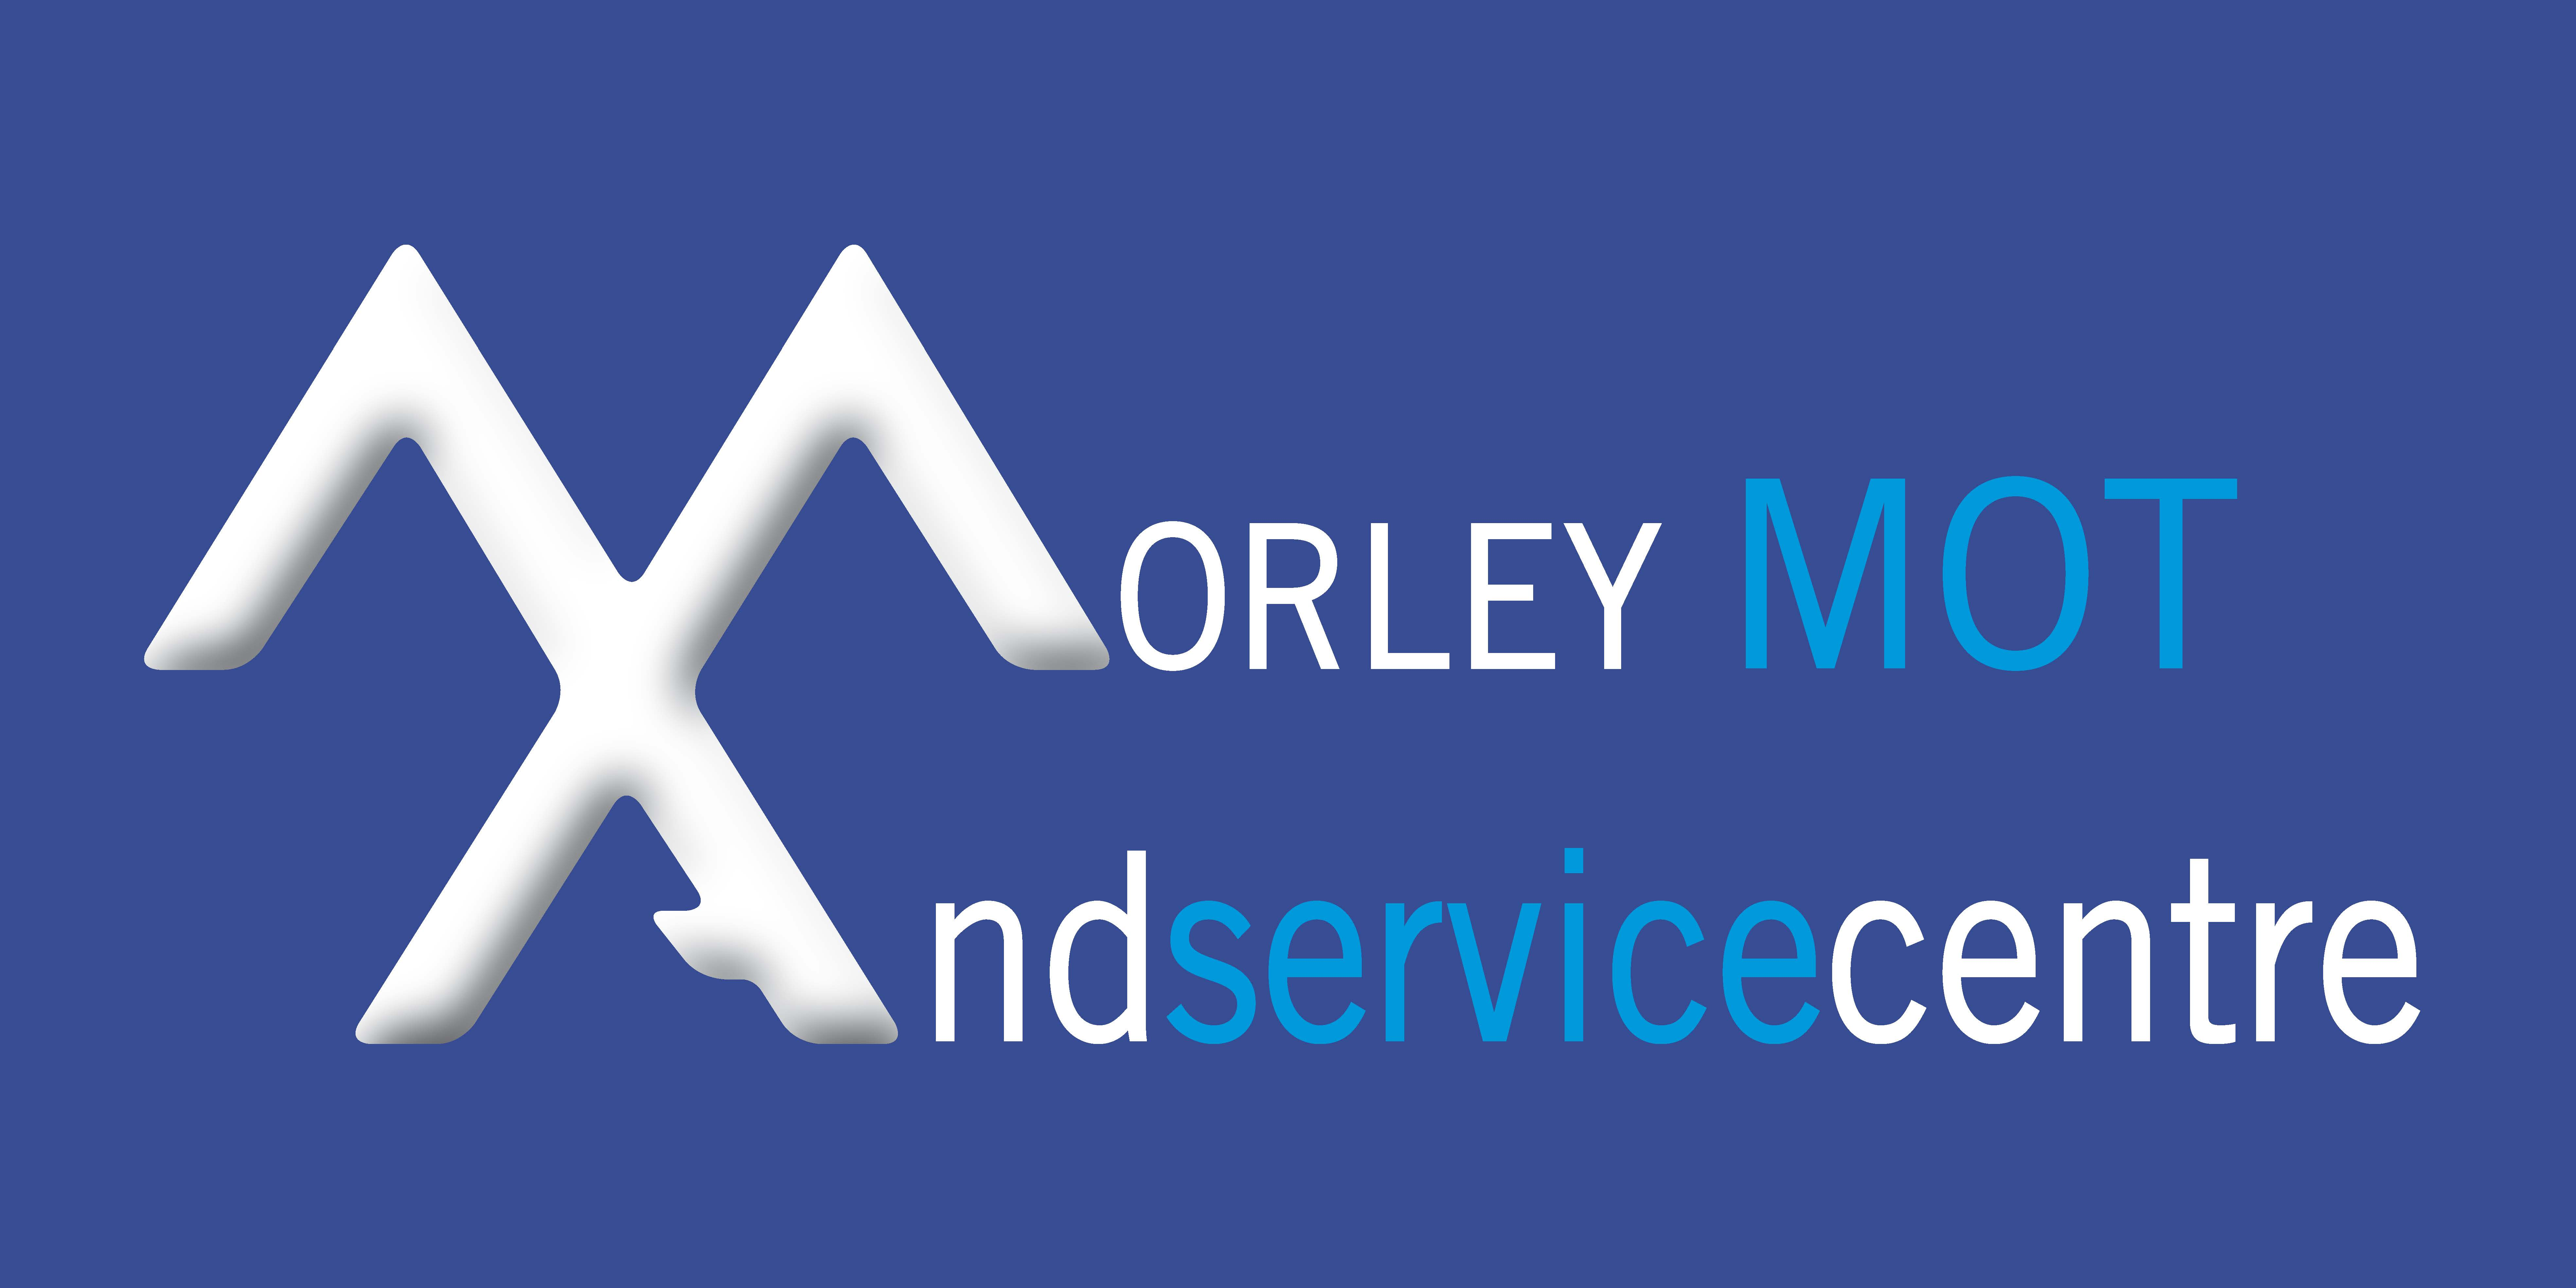 Morley Mot & Service Centre